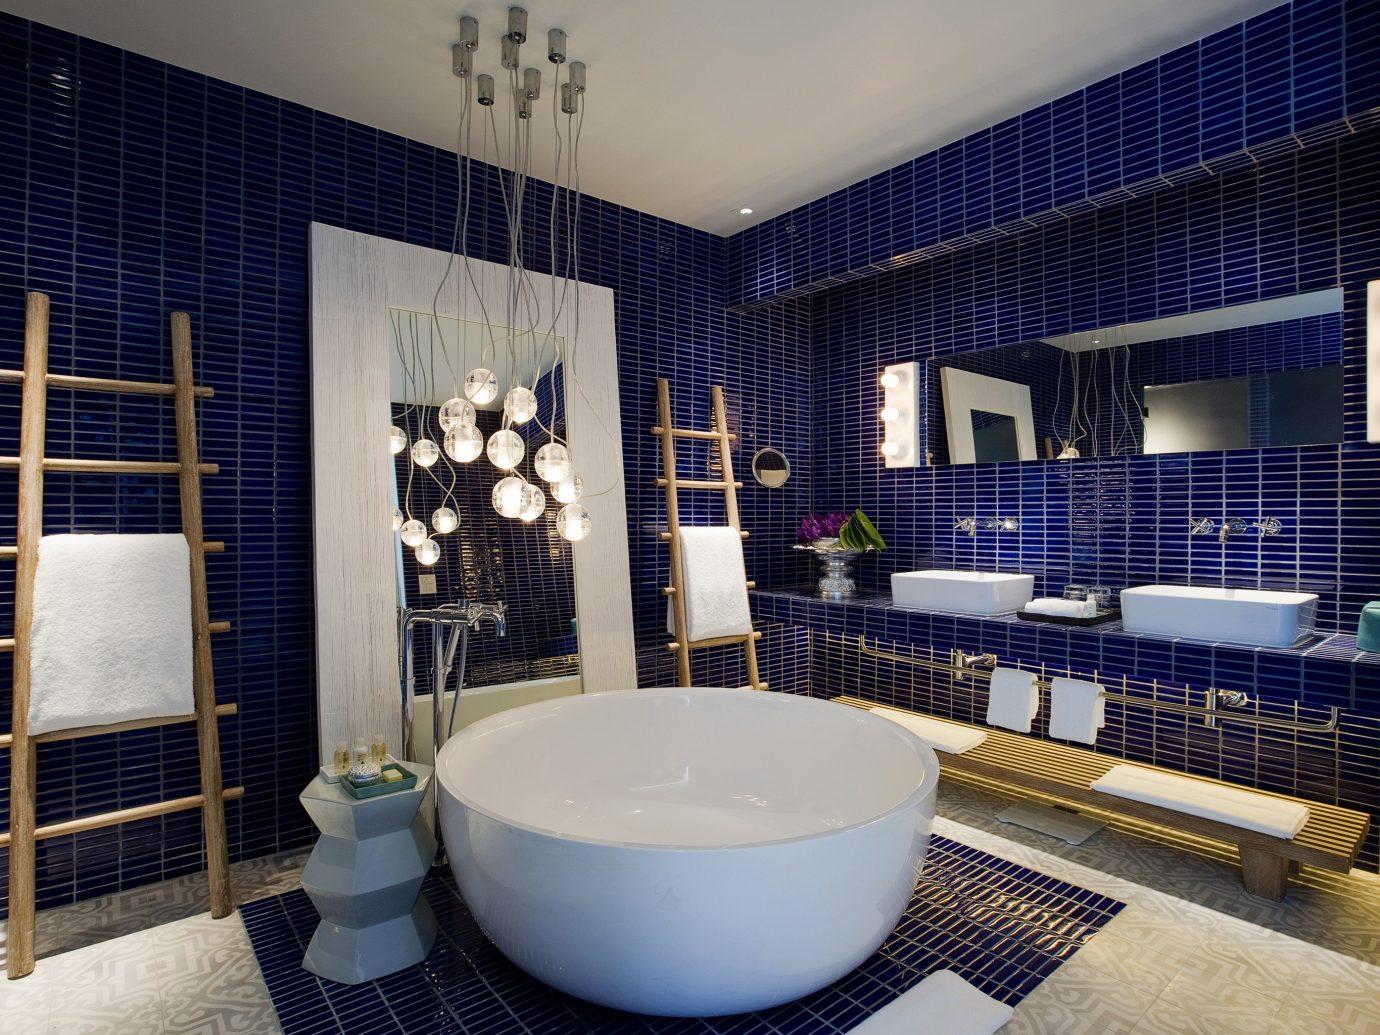 Beach Hotels Phuket Thailand indoor floor room bathroom interior design Architecture estate home real estate angle interior designer house window tile tub tiled bathtub